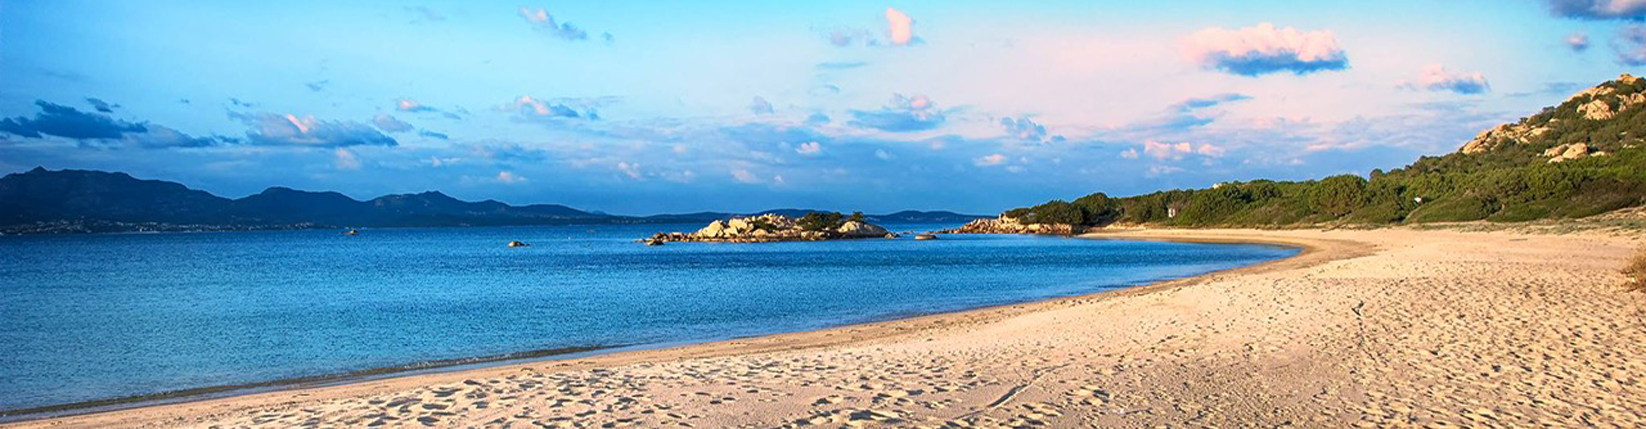 Spiaggie Smart Sardinia a Olbia Sassari